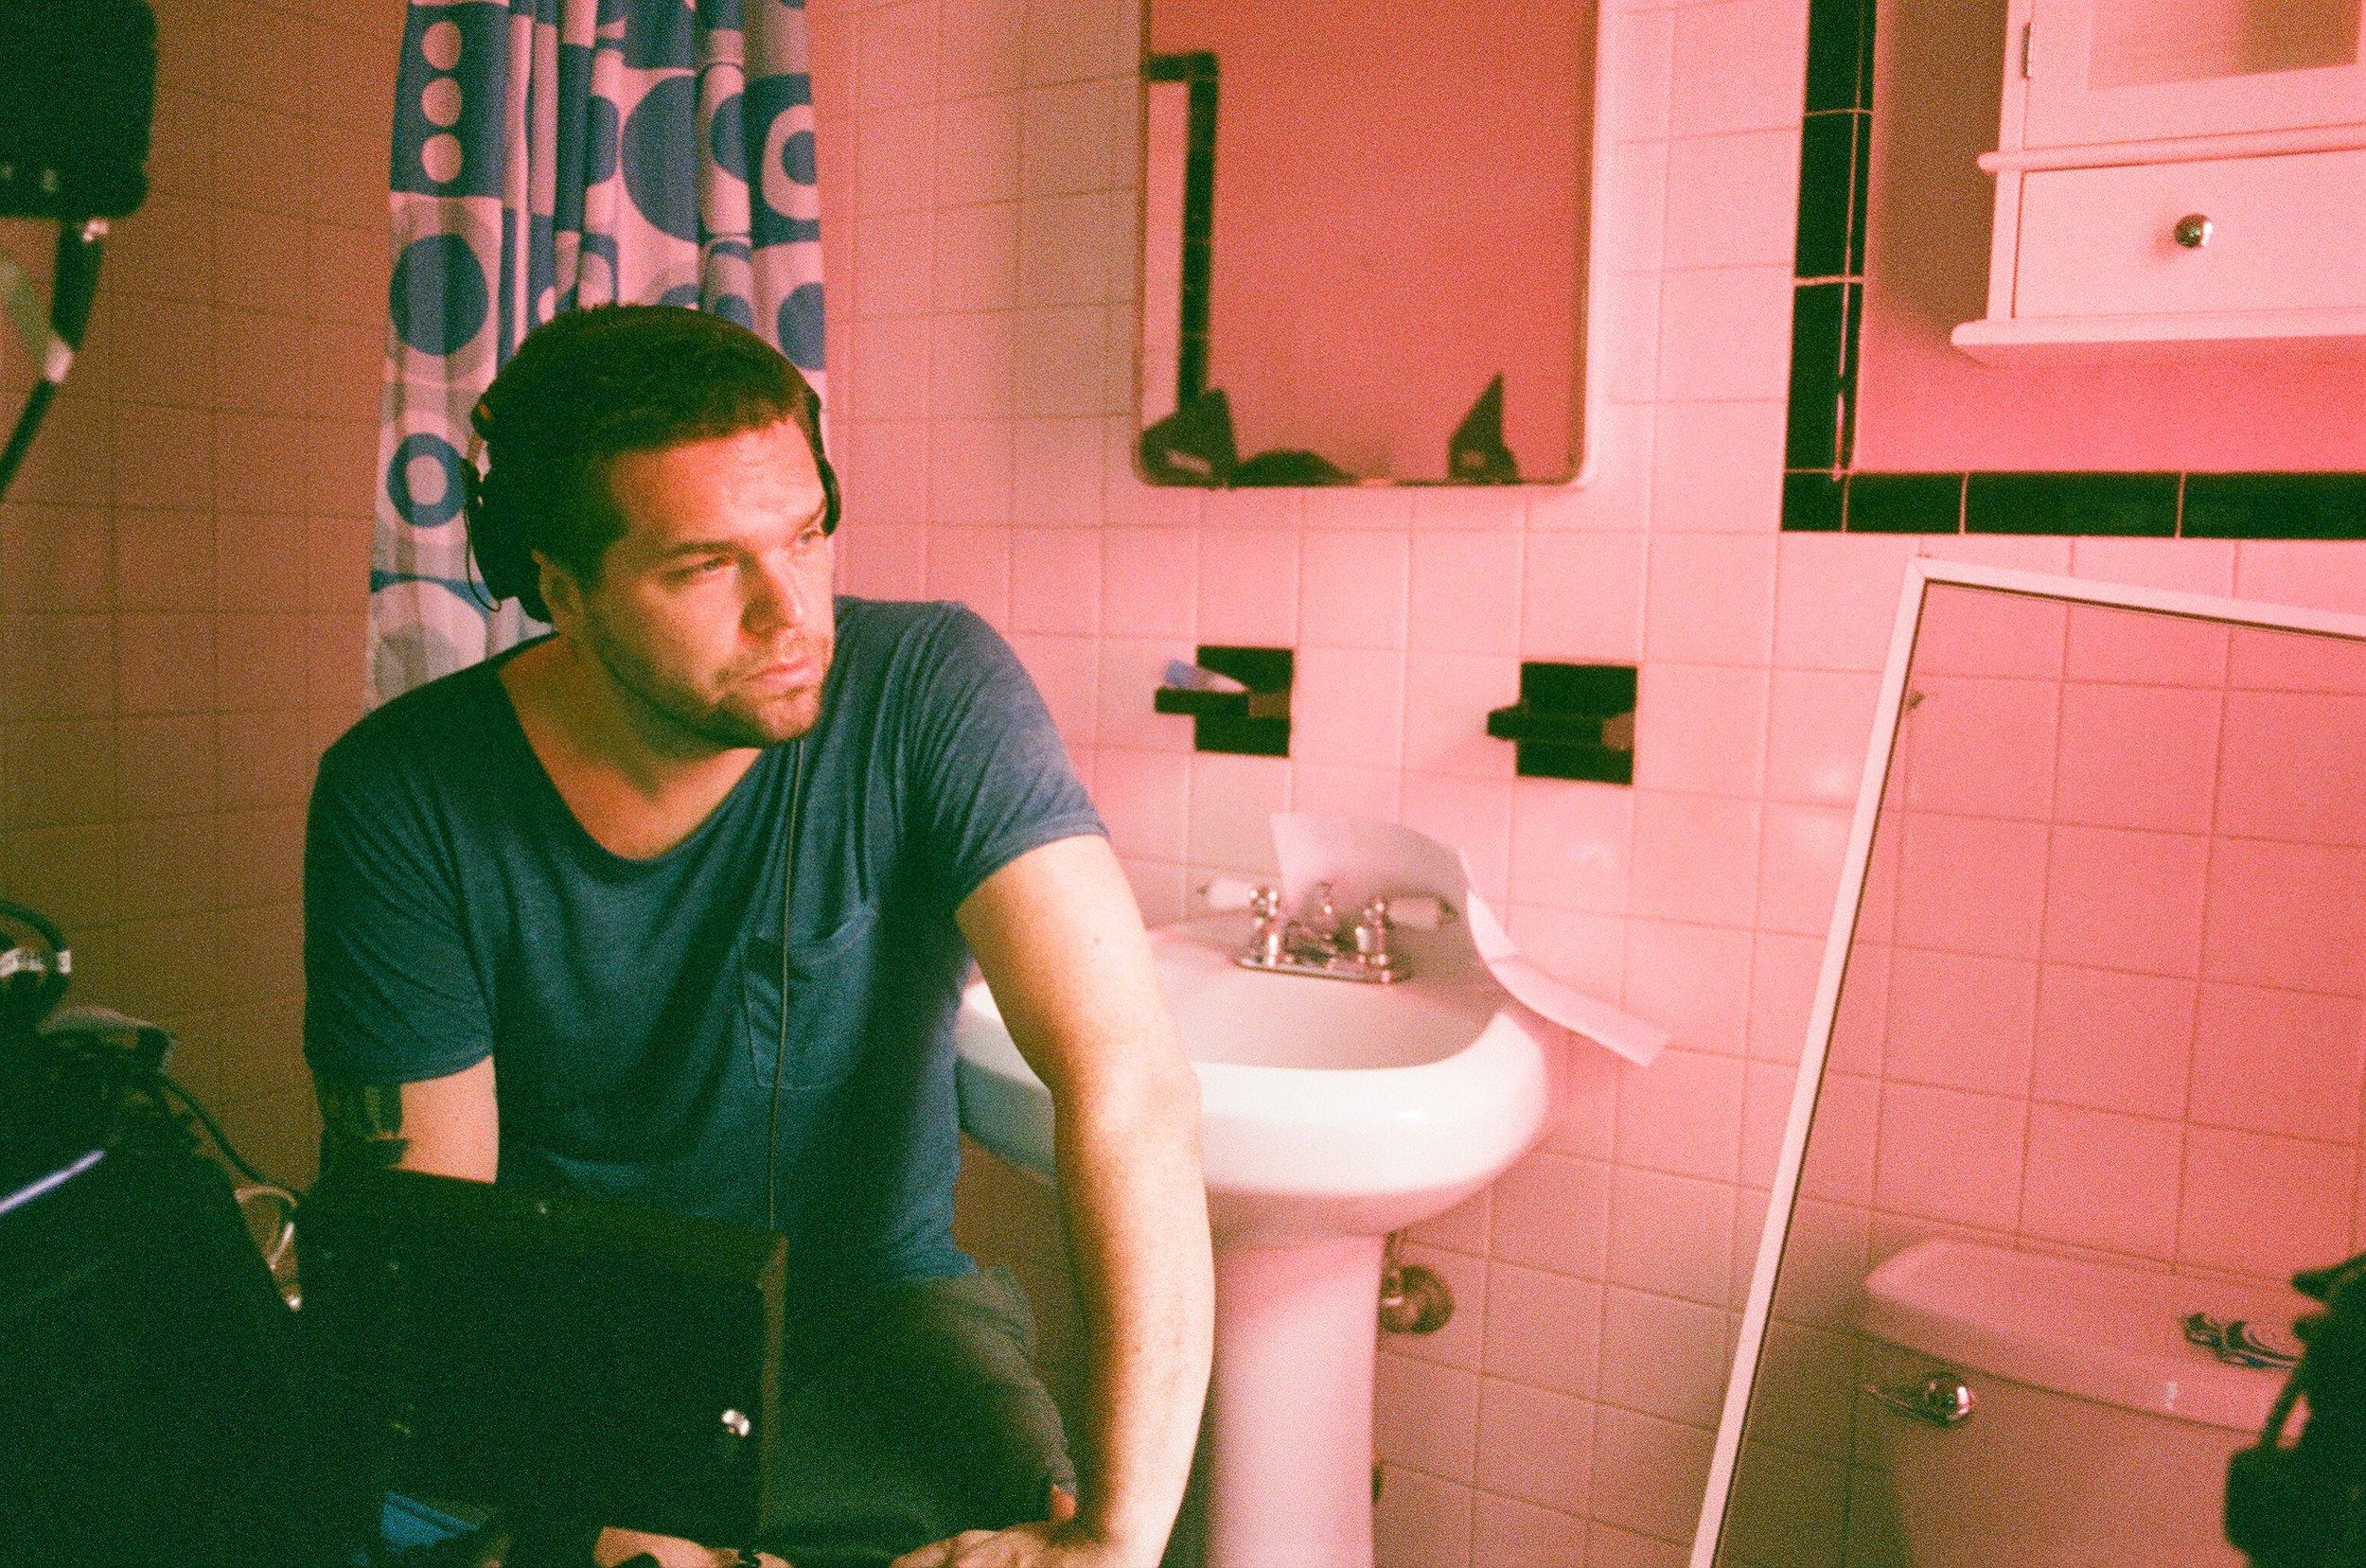 Dan Mixing in a Pink Bathroom